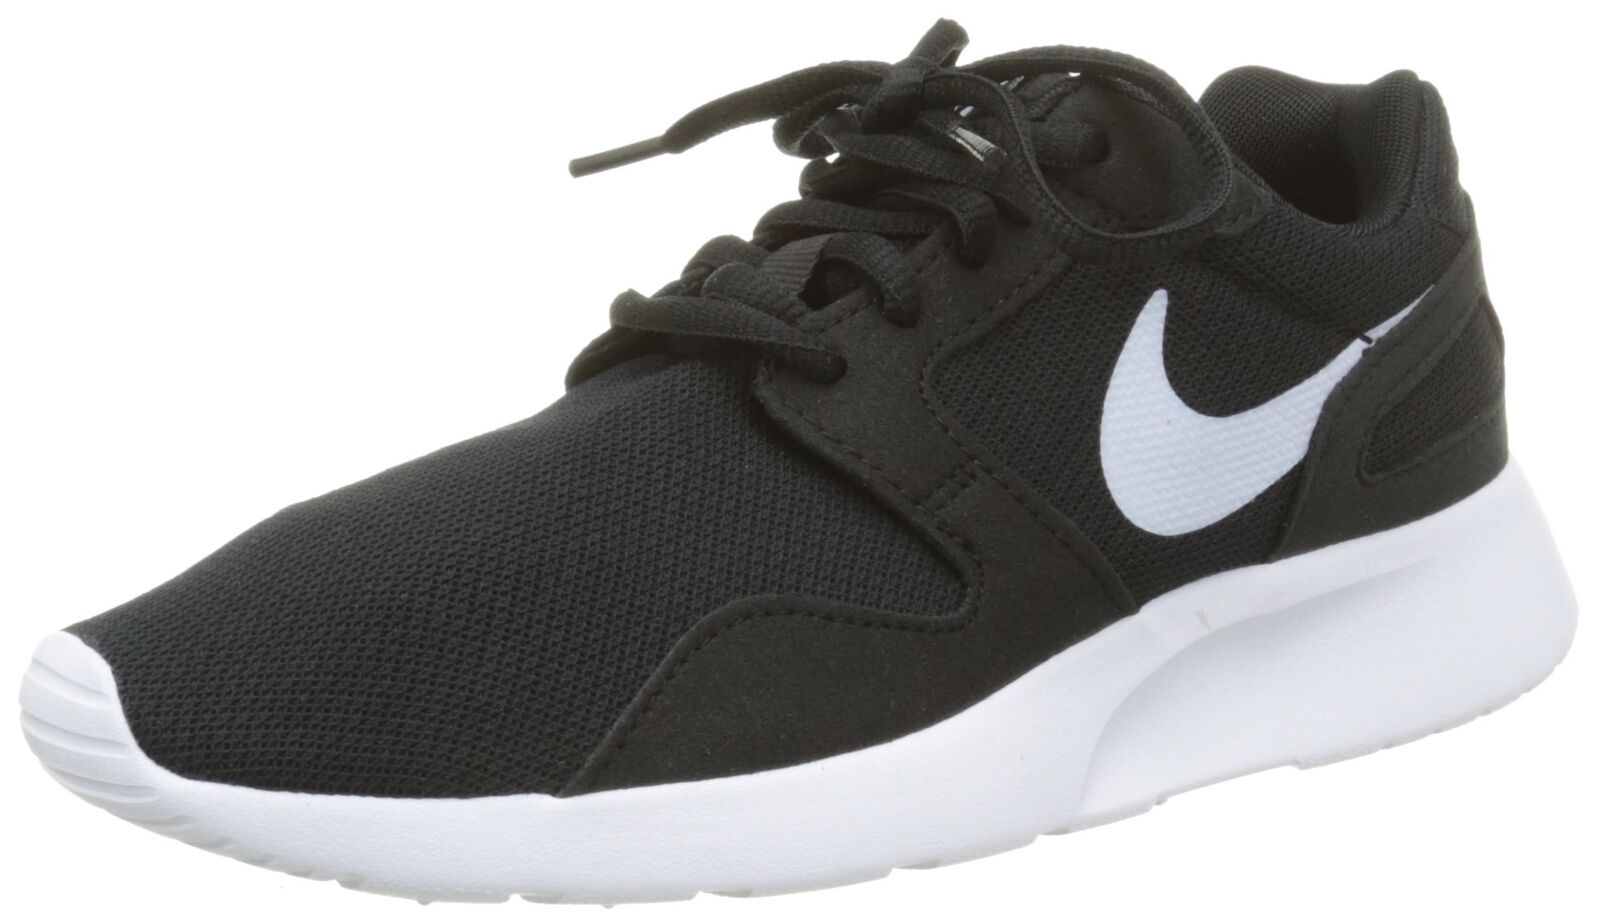 Nike Womens Kaishi Sneaker, 9, Black